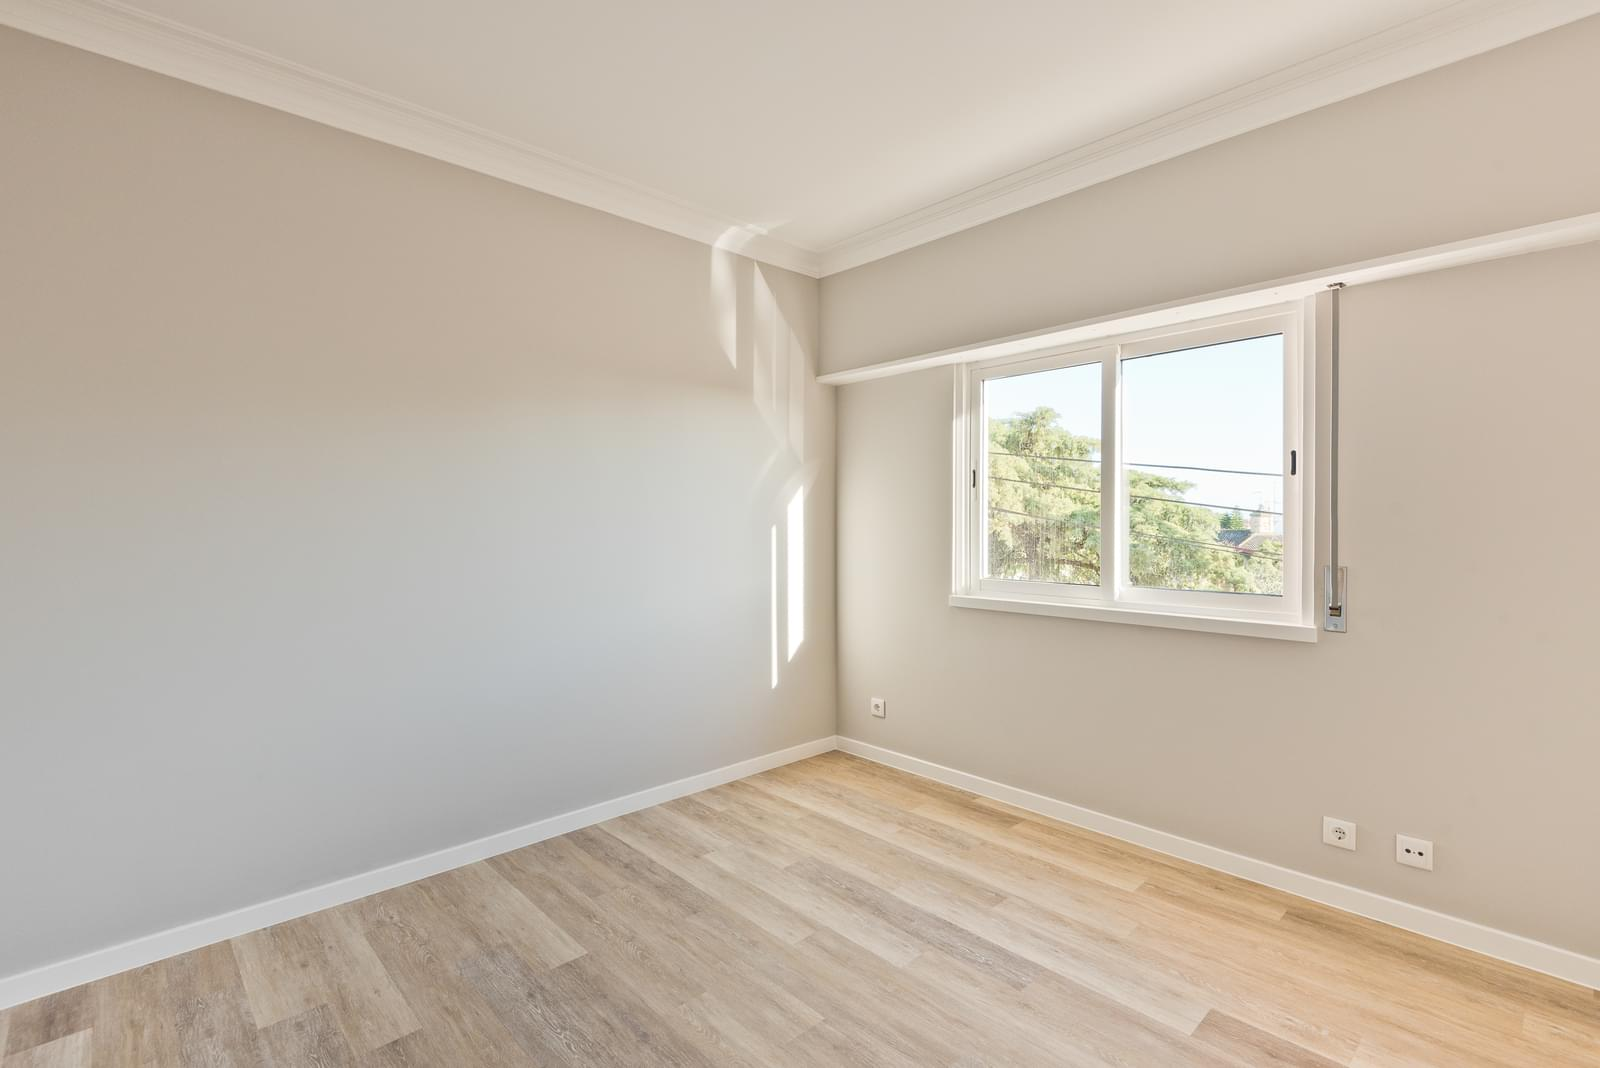 pf18954-apartamento-t3-cascais-79fdaab0-296d-4414-92fa-311791f15e9c